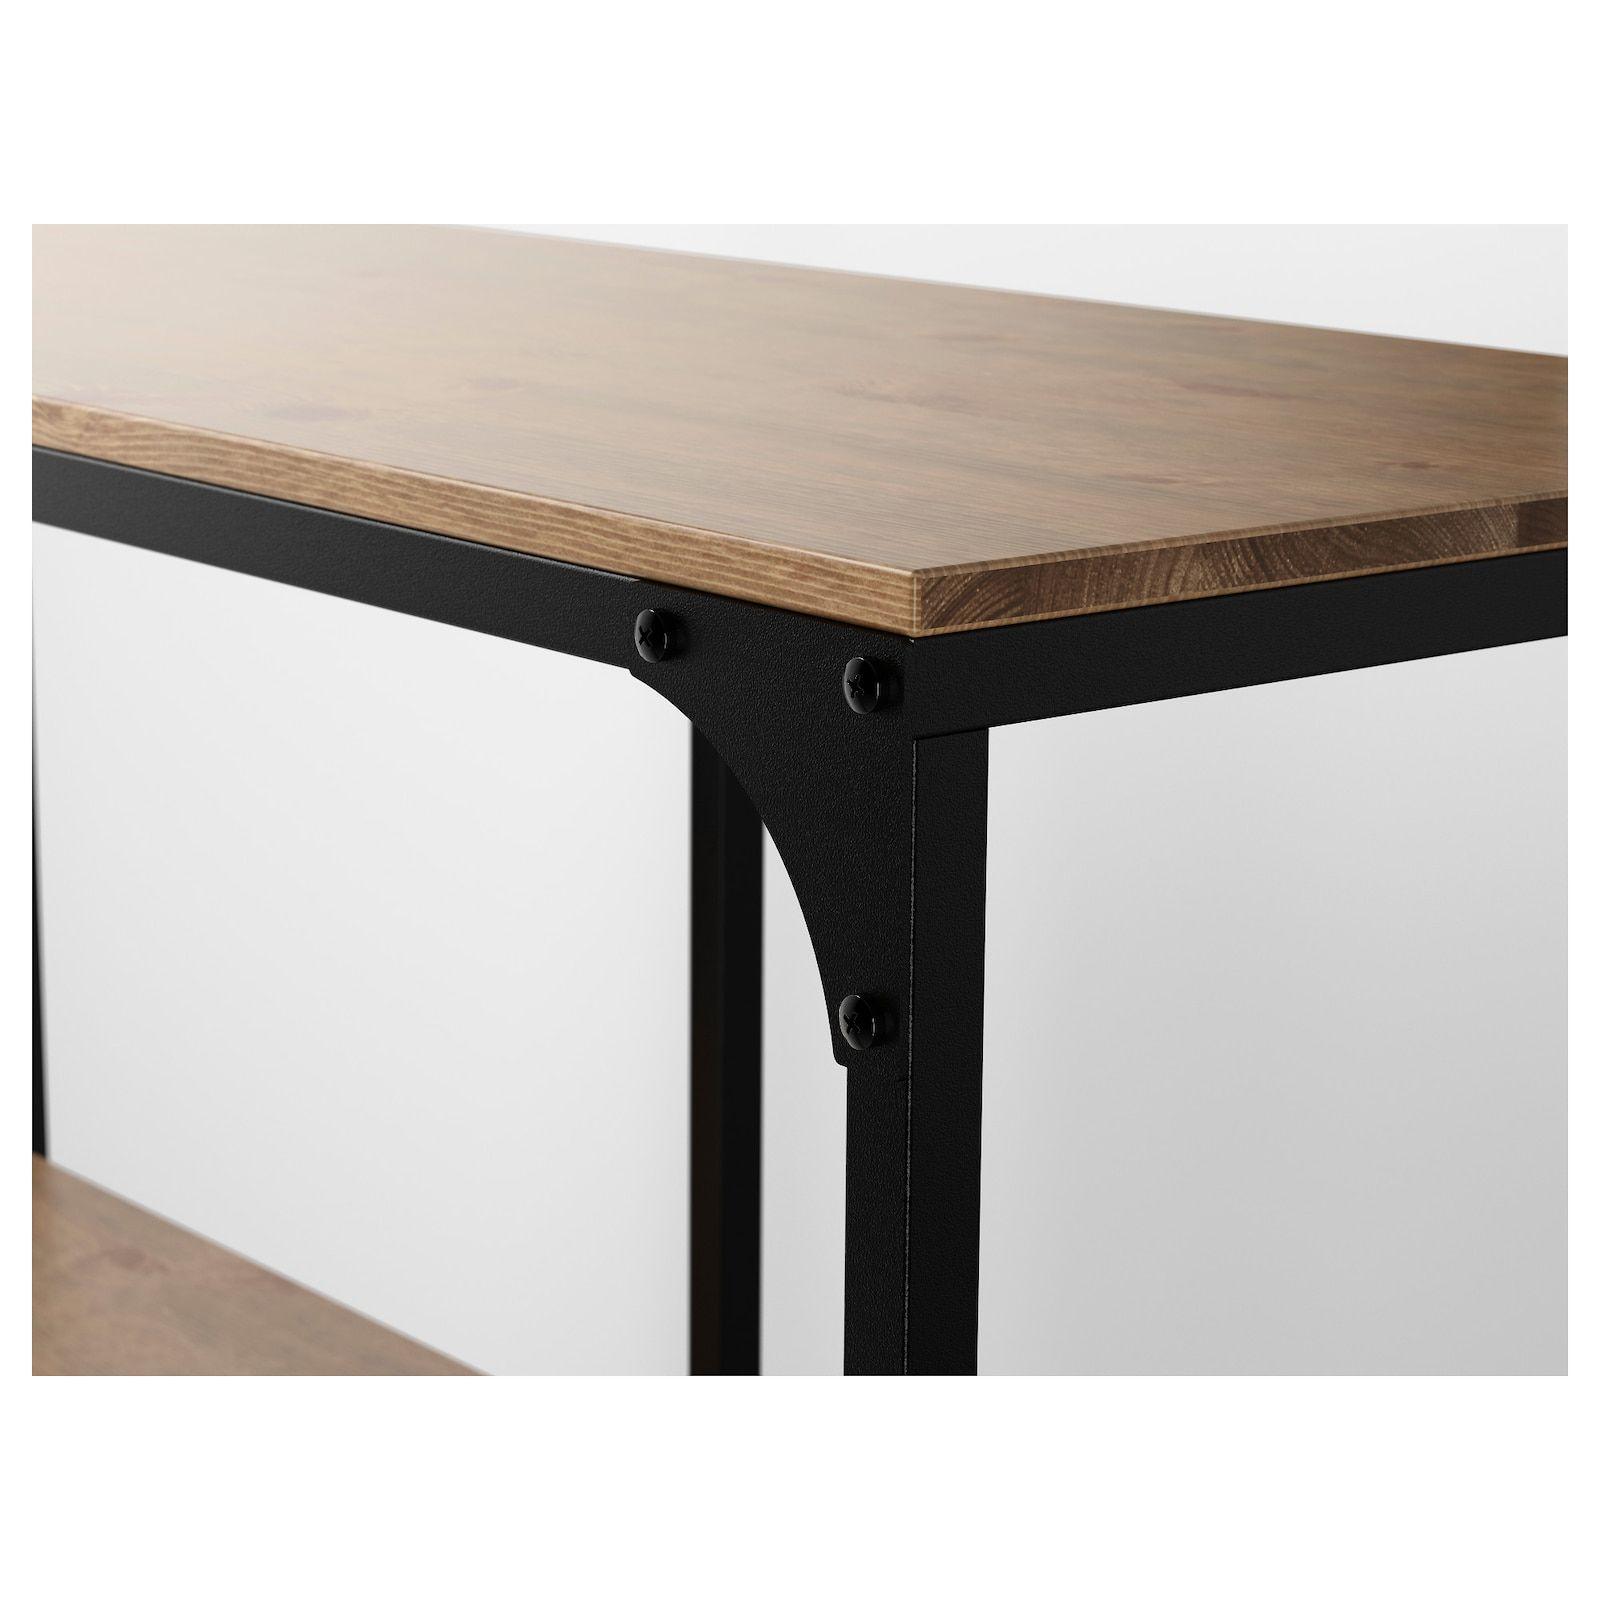 Fjallbo وحدة رفوف أسود 100x95 سم Ikea Shelf Unit Ikea Solid Wood Shelves